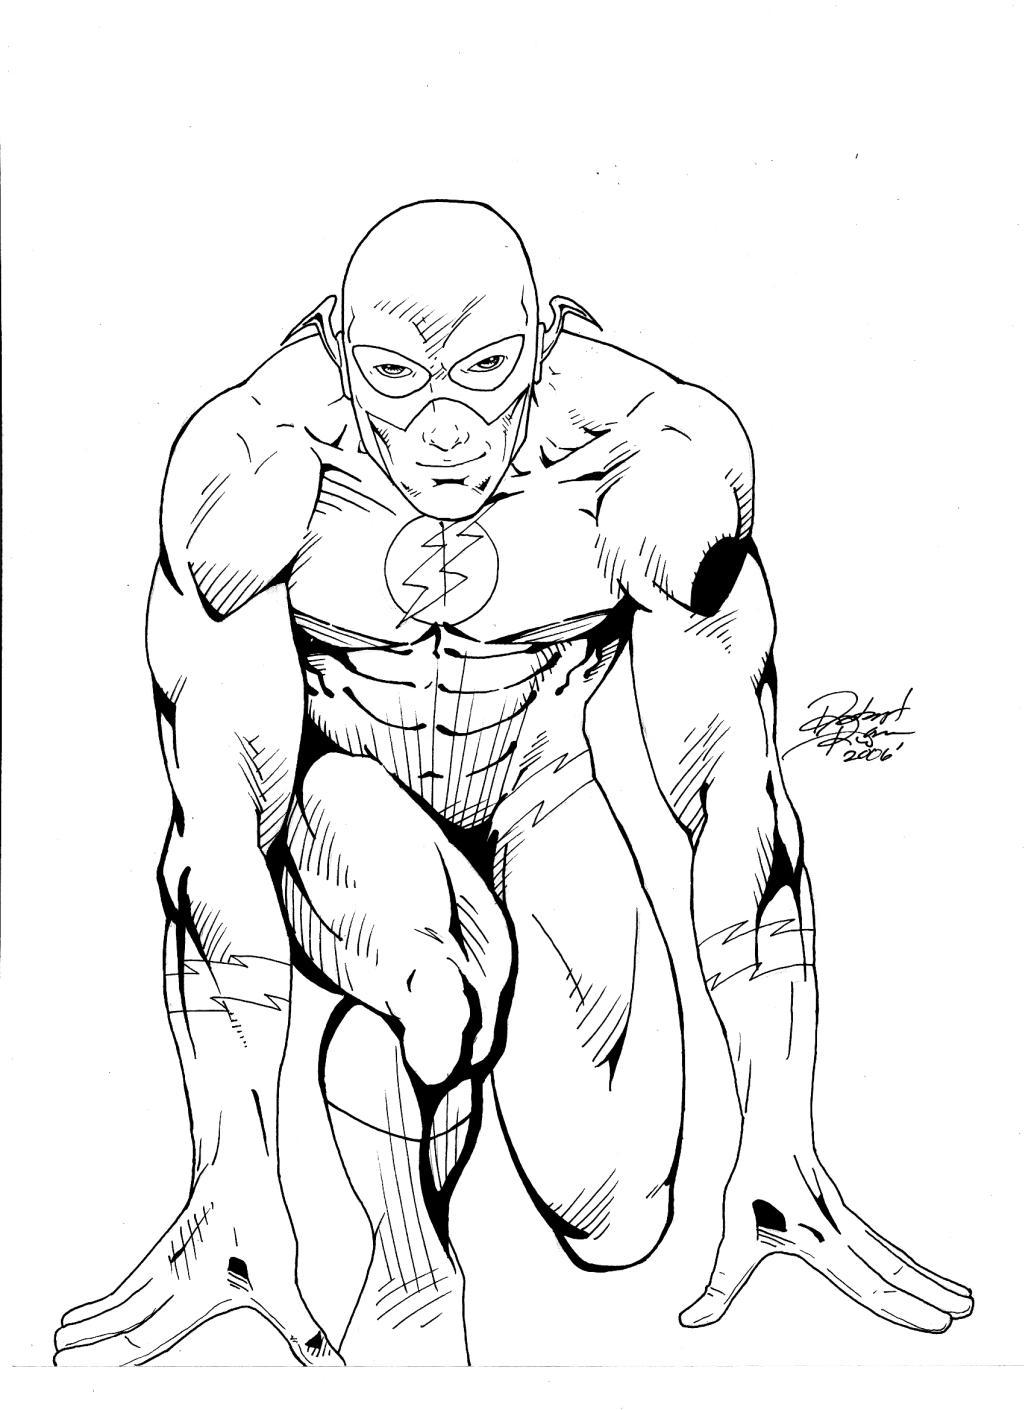 The Flash Line Art : The flash ready set go by robertdanielryan on deviantart